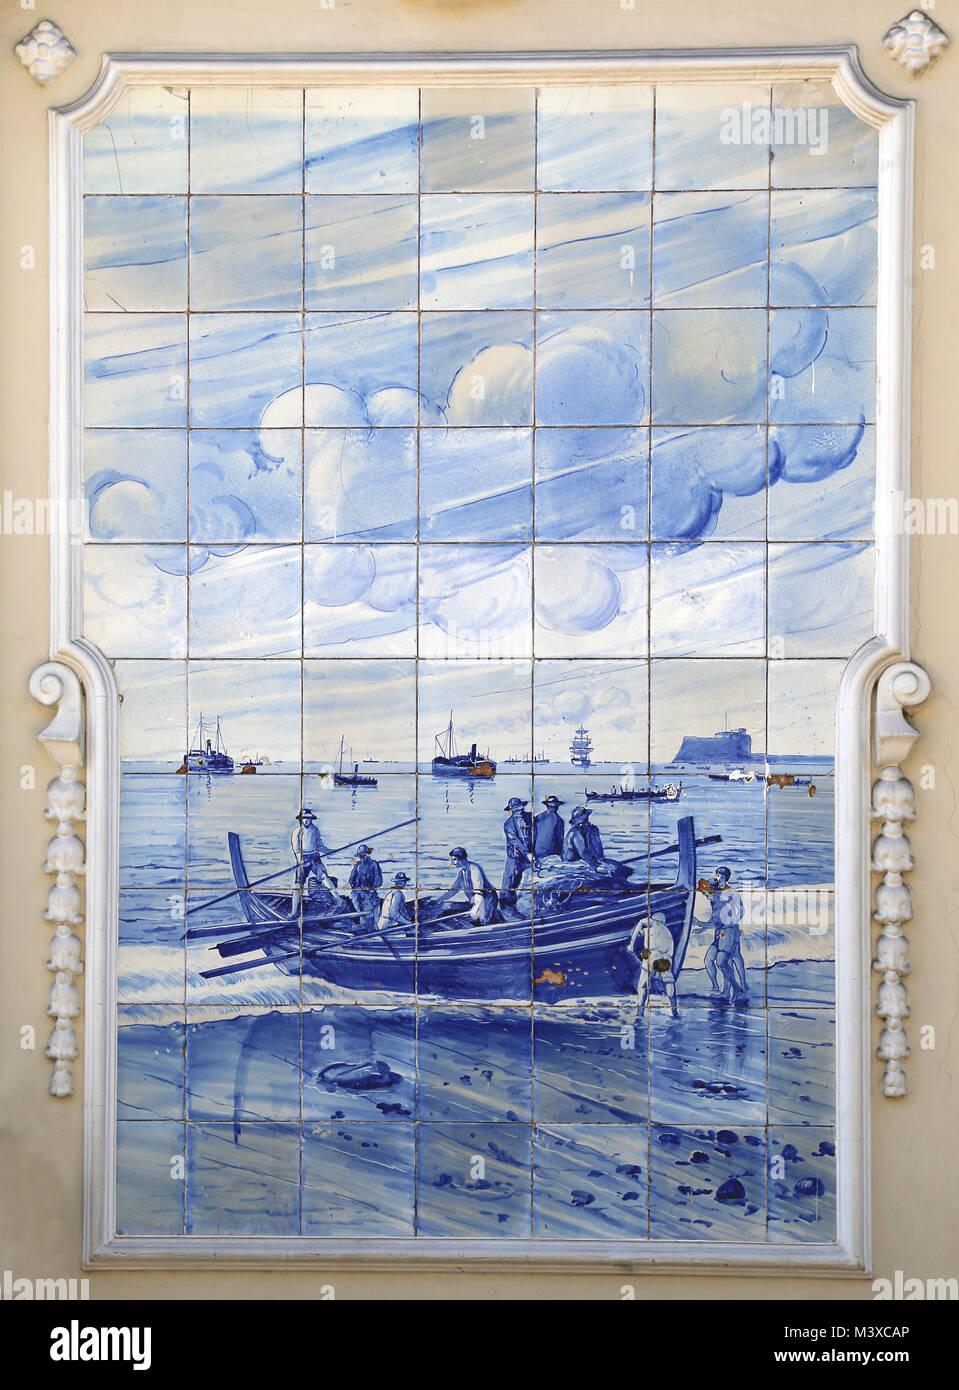 Azulejo of The Ritz Cafe. Ceramic glazed blue tiles depicting rural scene. Around 1908. Funchal, Madeira Island. - Stock Image